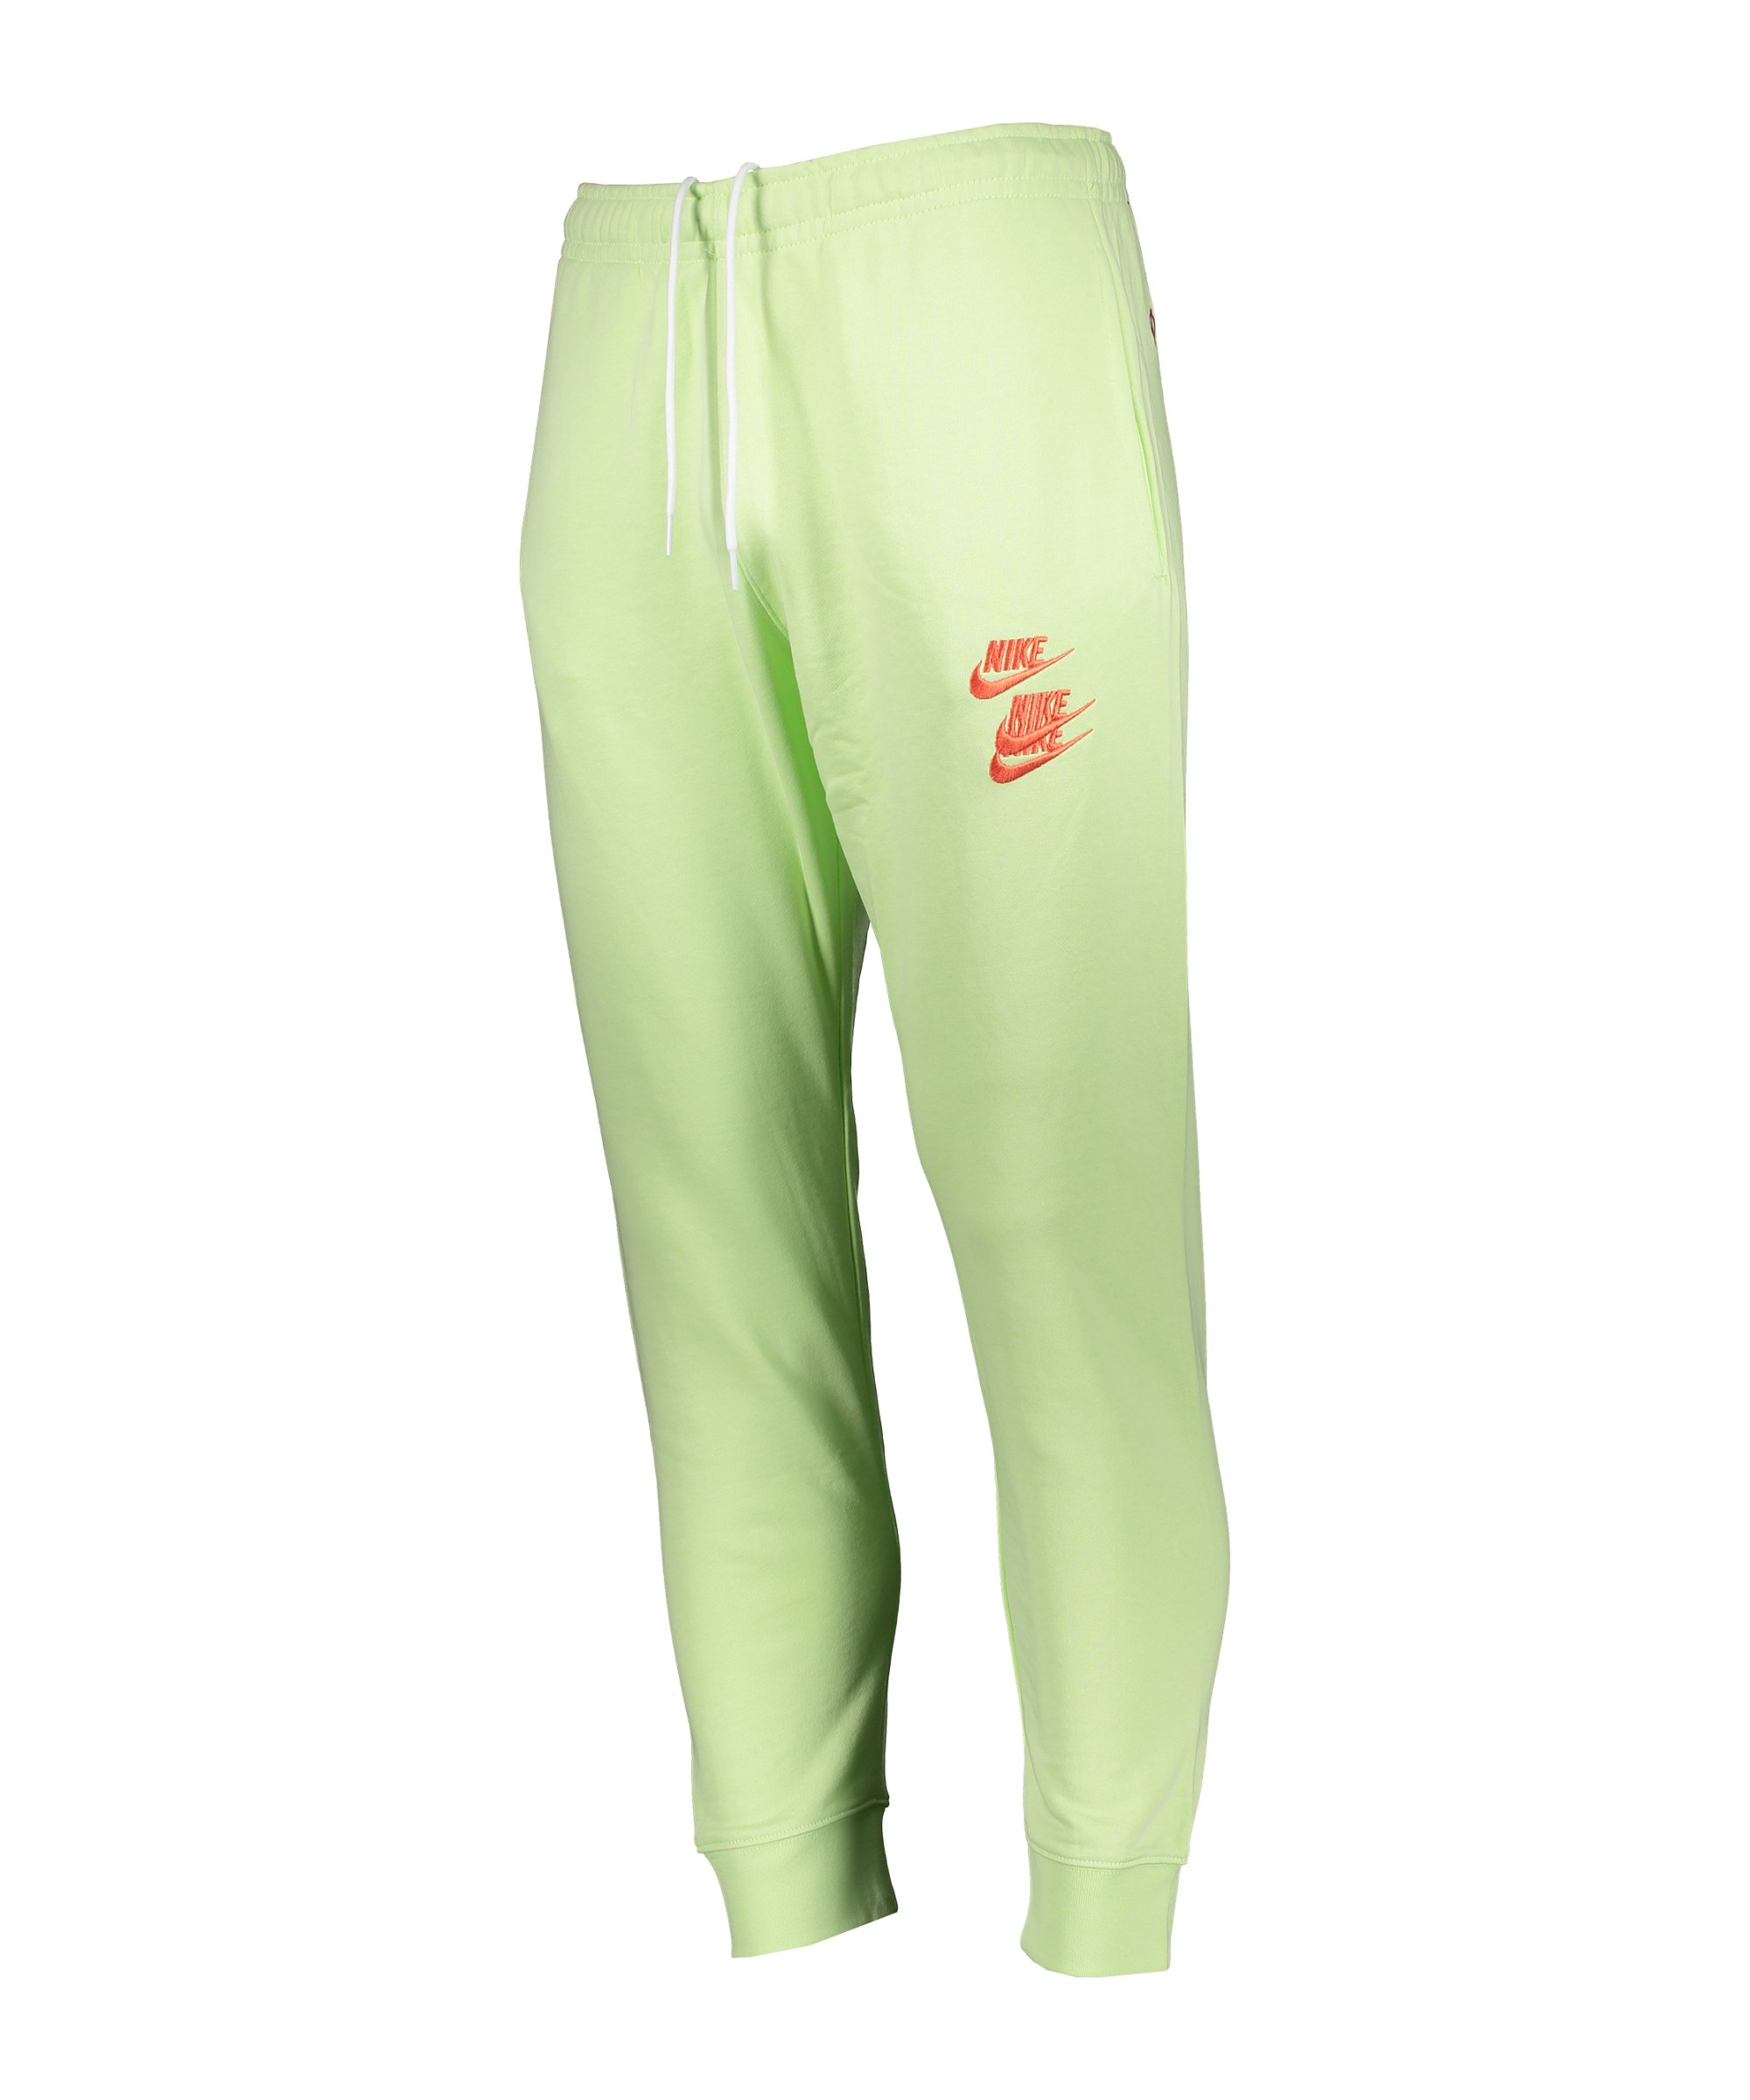 Nike World Tour Jogginghose Grün F383 - gruen